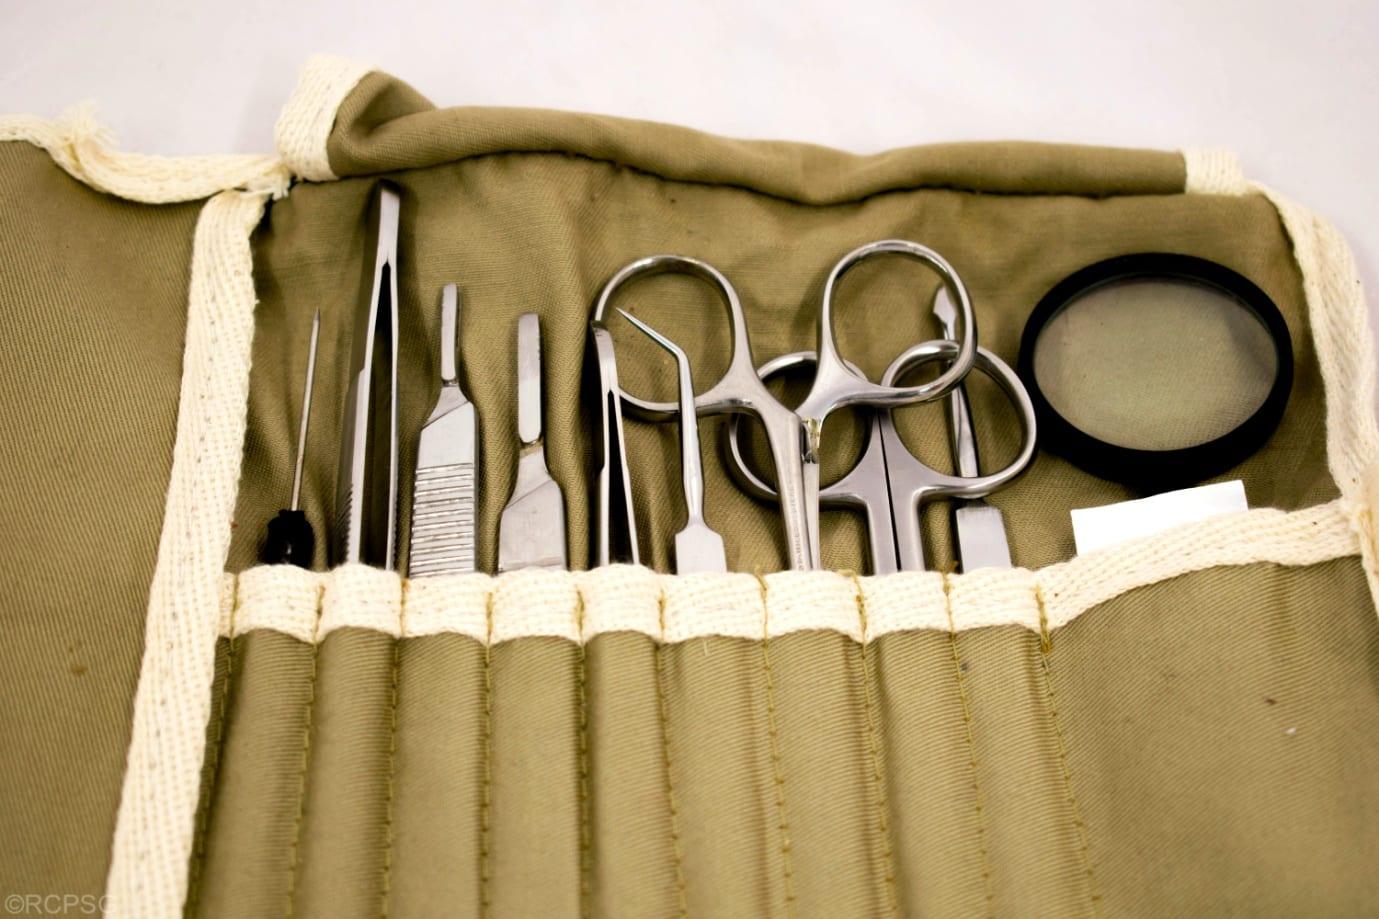 kirstys-tools